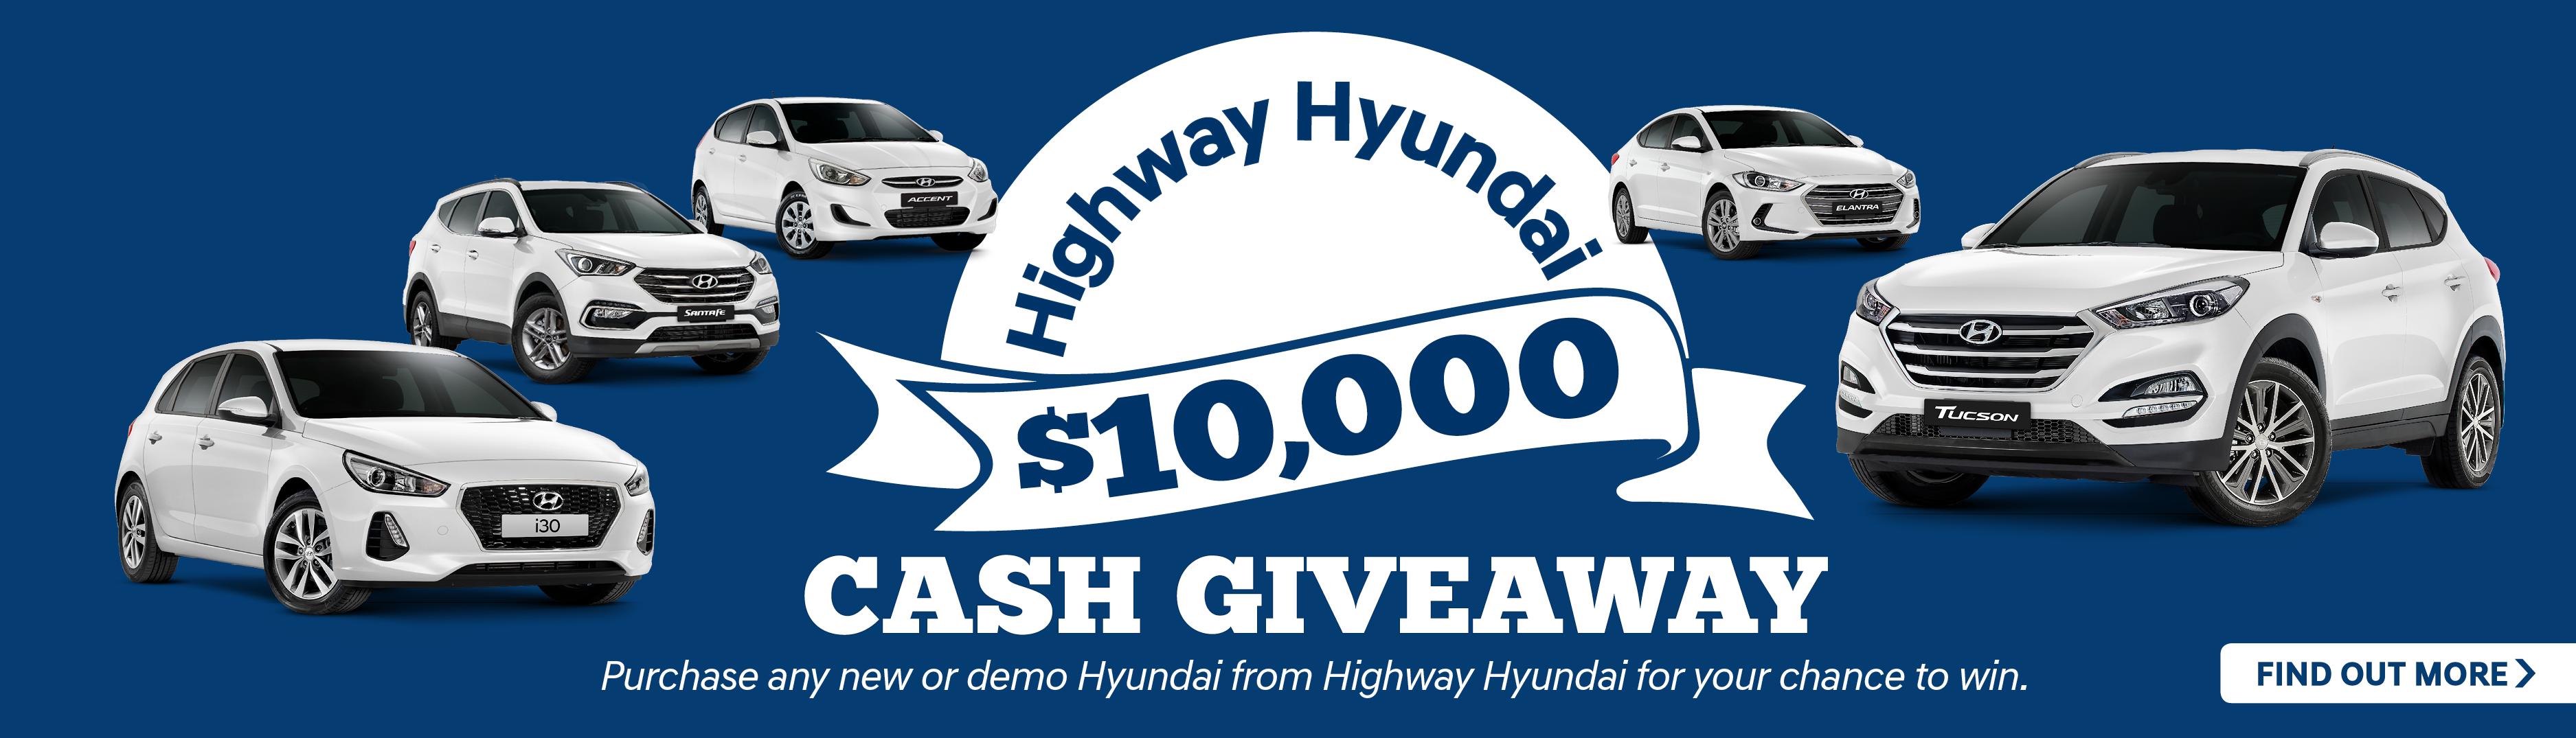 Highway Hyundai $10,000 Cash Giveaway